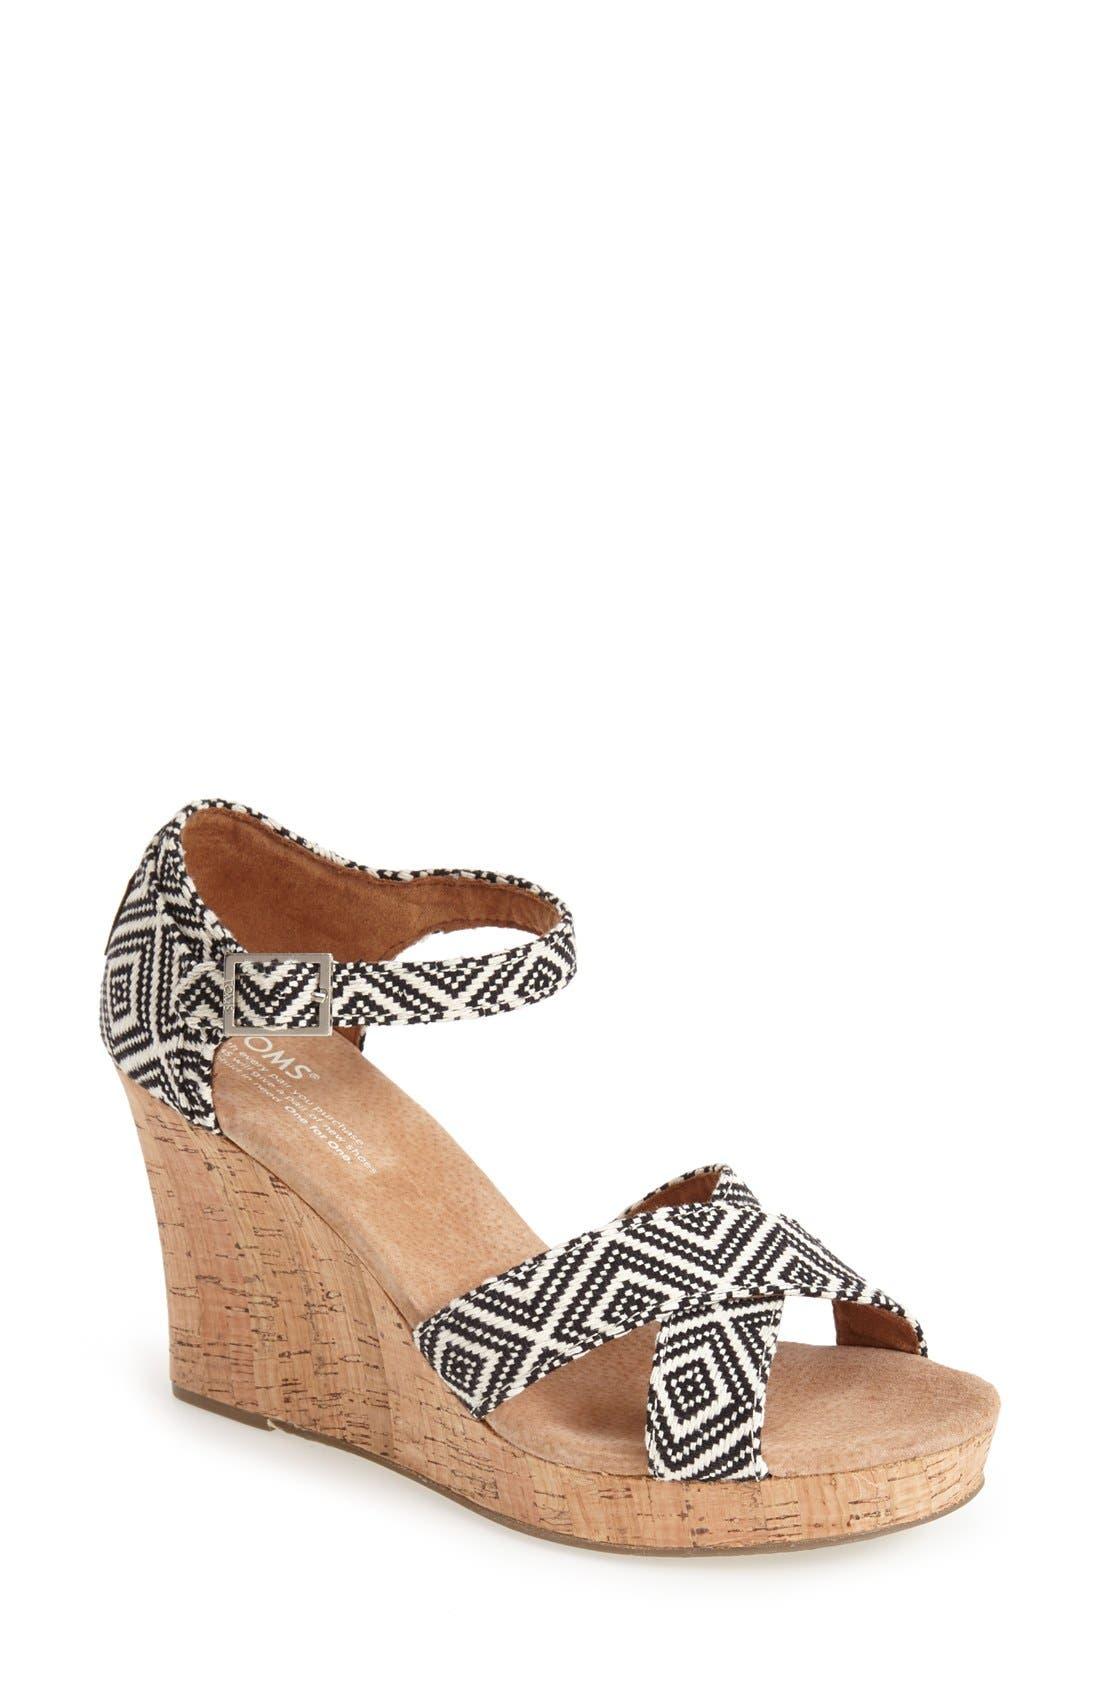 Alternate Image 1 Selected - TOMS Canvas Woven Geometric Print Wedge Sandal (Women)